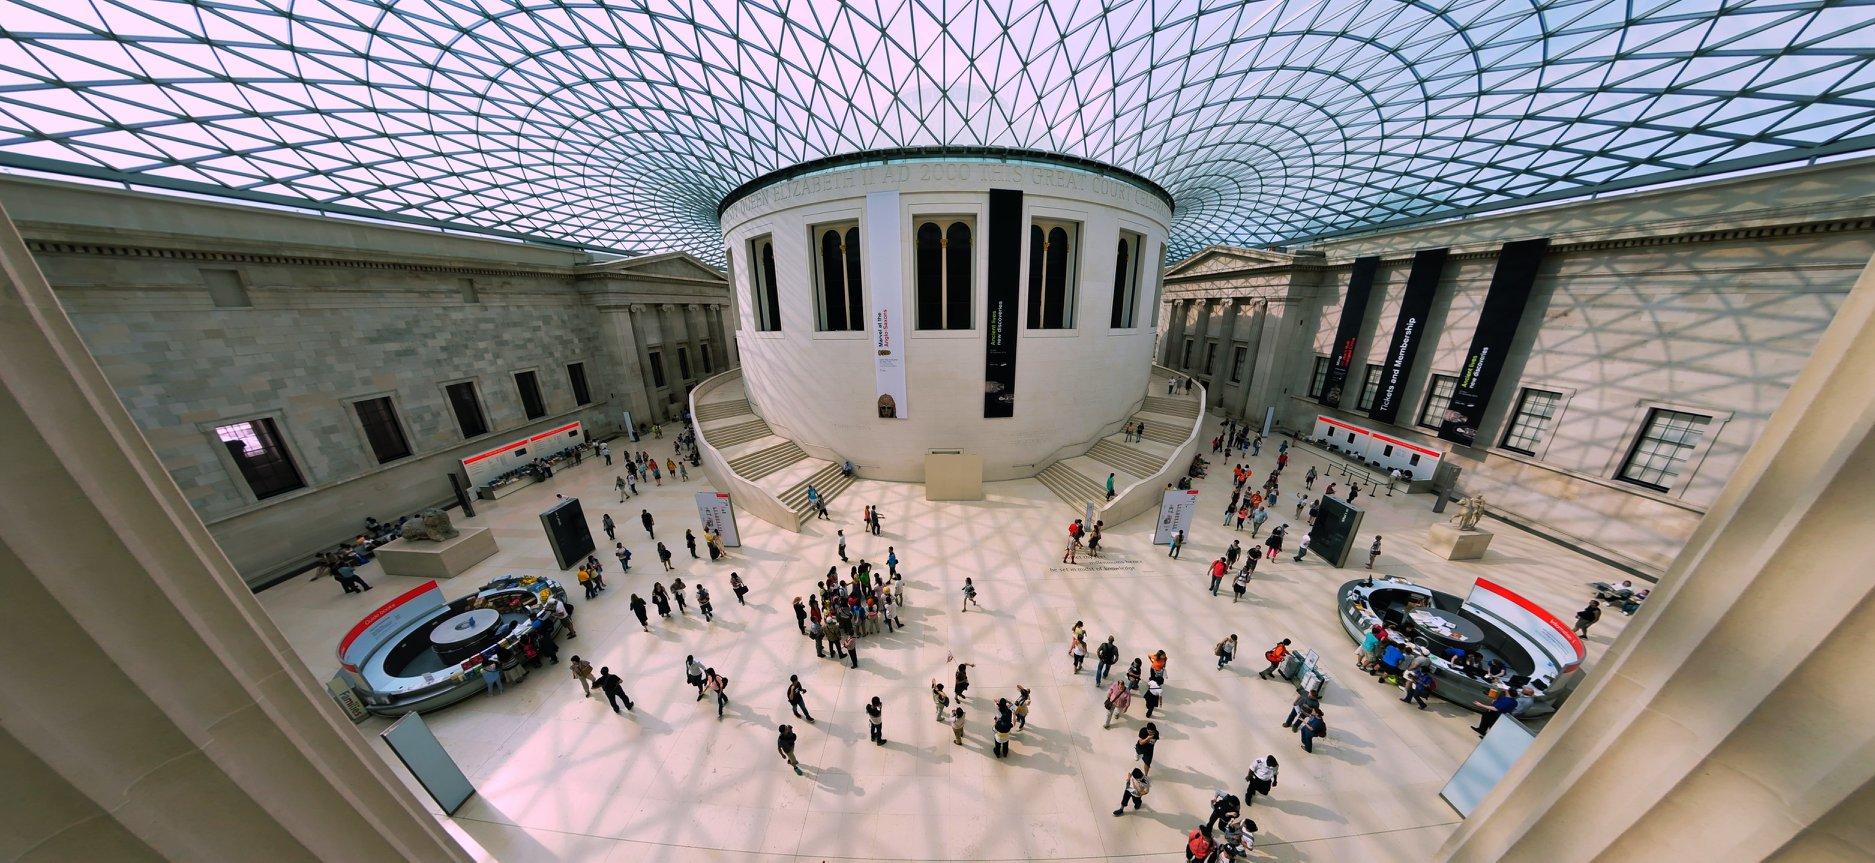 British Museum, fot. Viktor Forgacs / unsplash.com, źródło: Biblioteka Gdynia